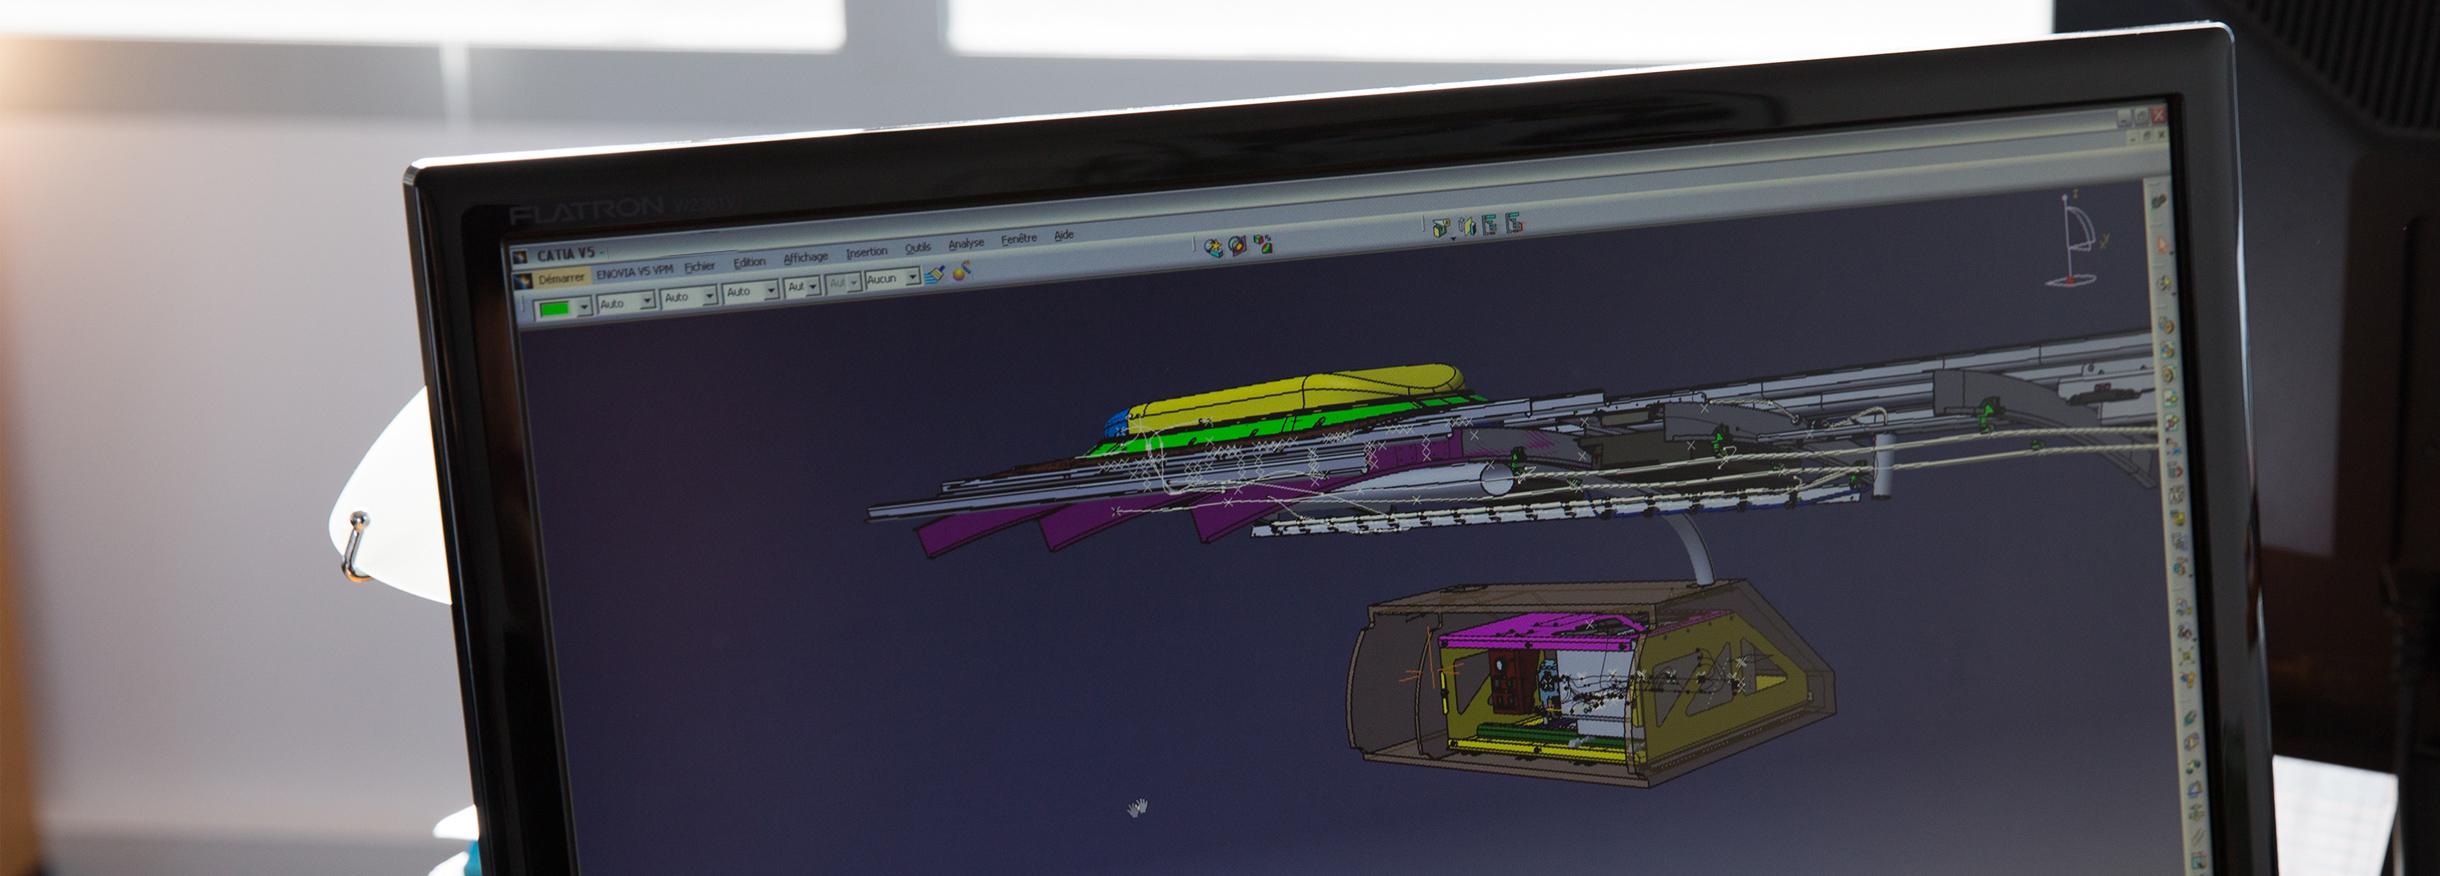 Eclipse Technics aircraft connectivity solution design